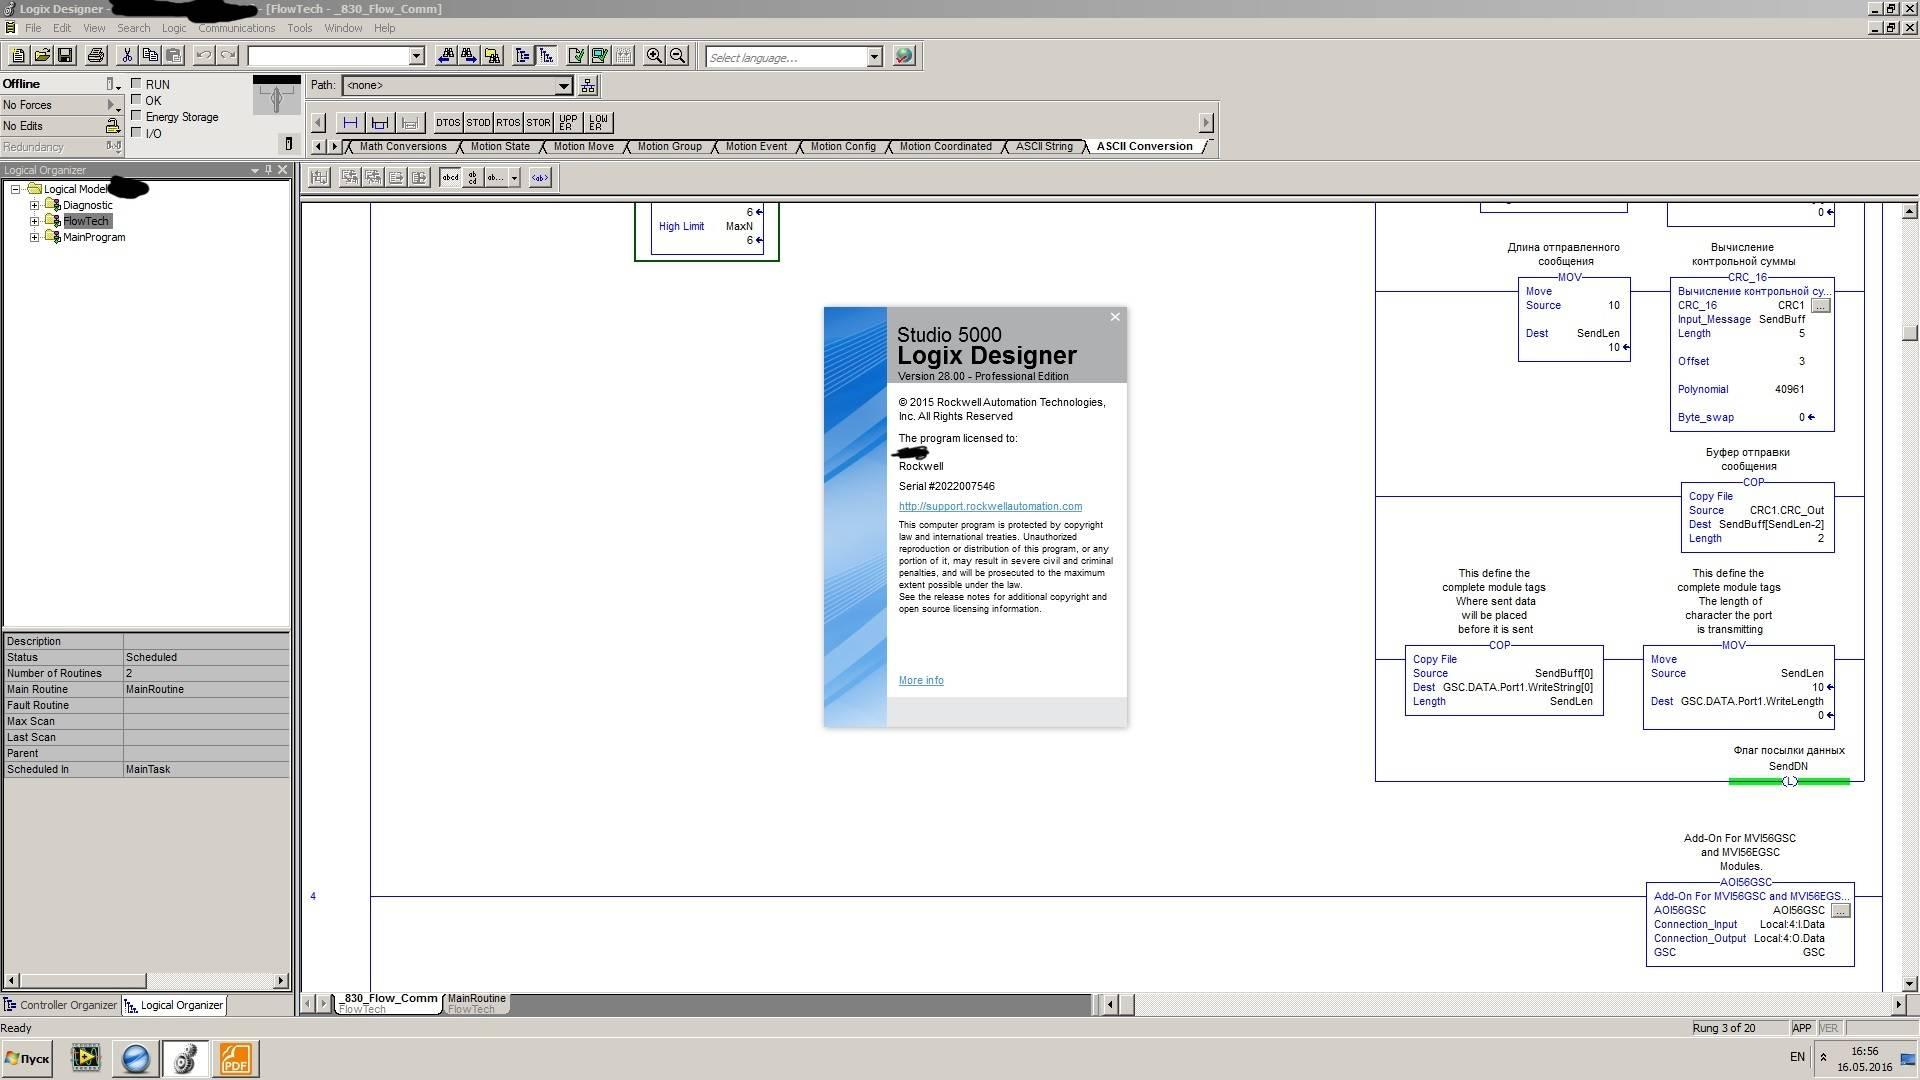 Rockwell Software Studio 5000 version 28.0